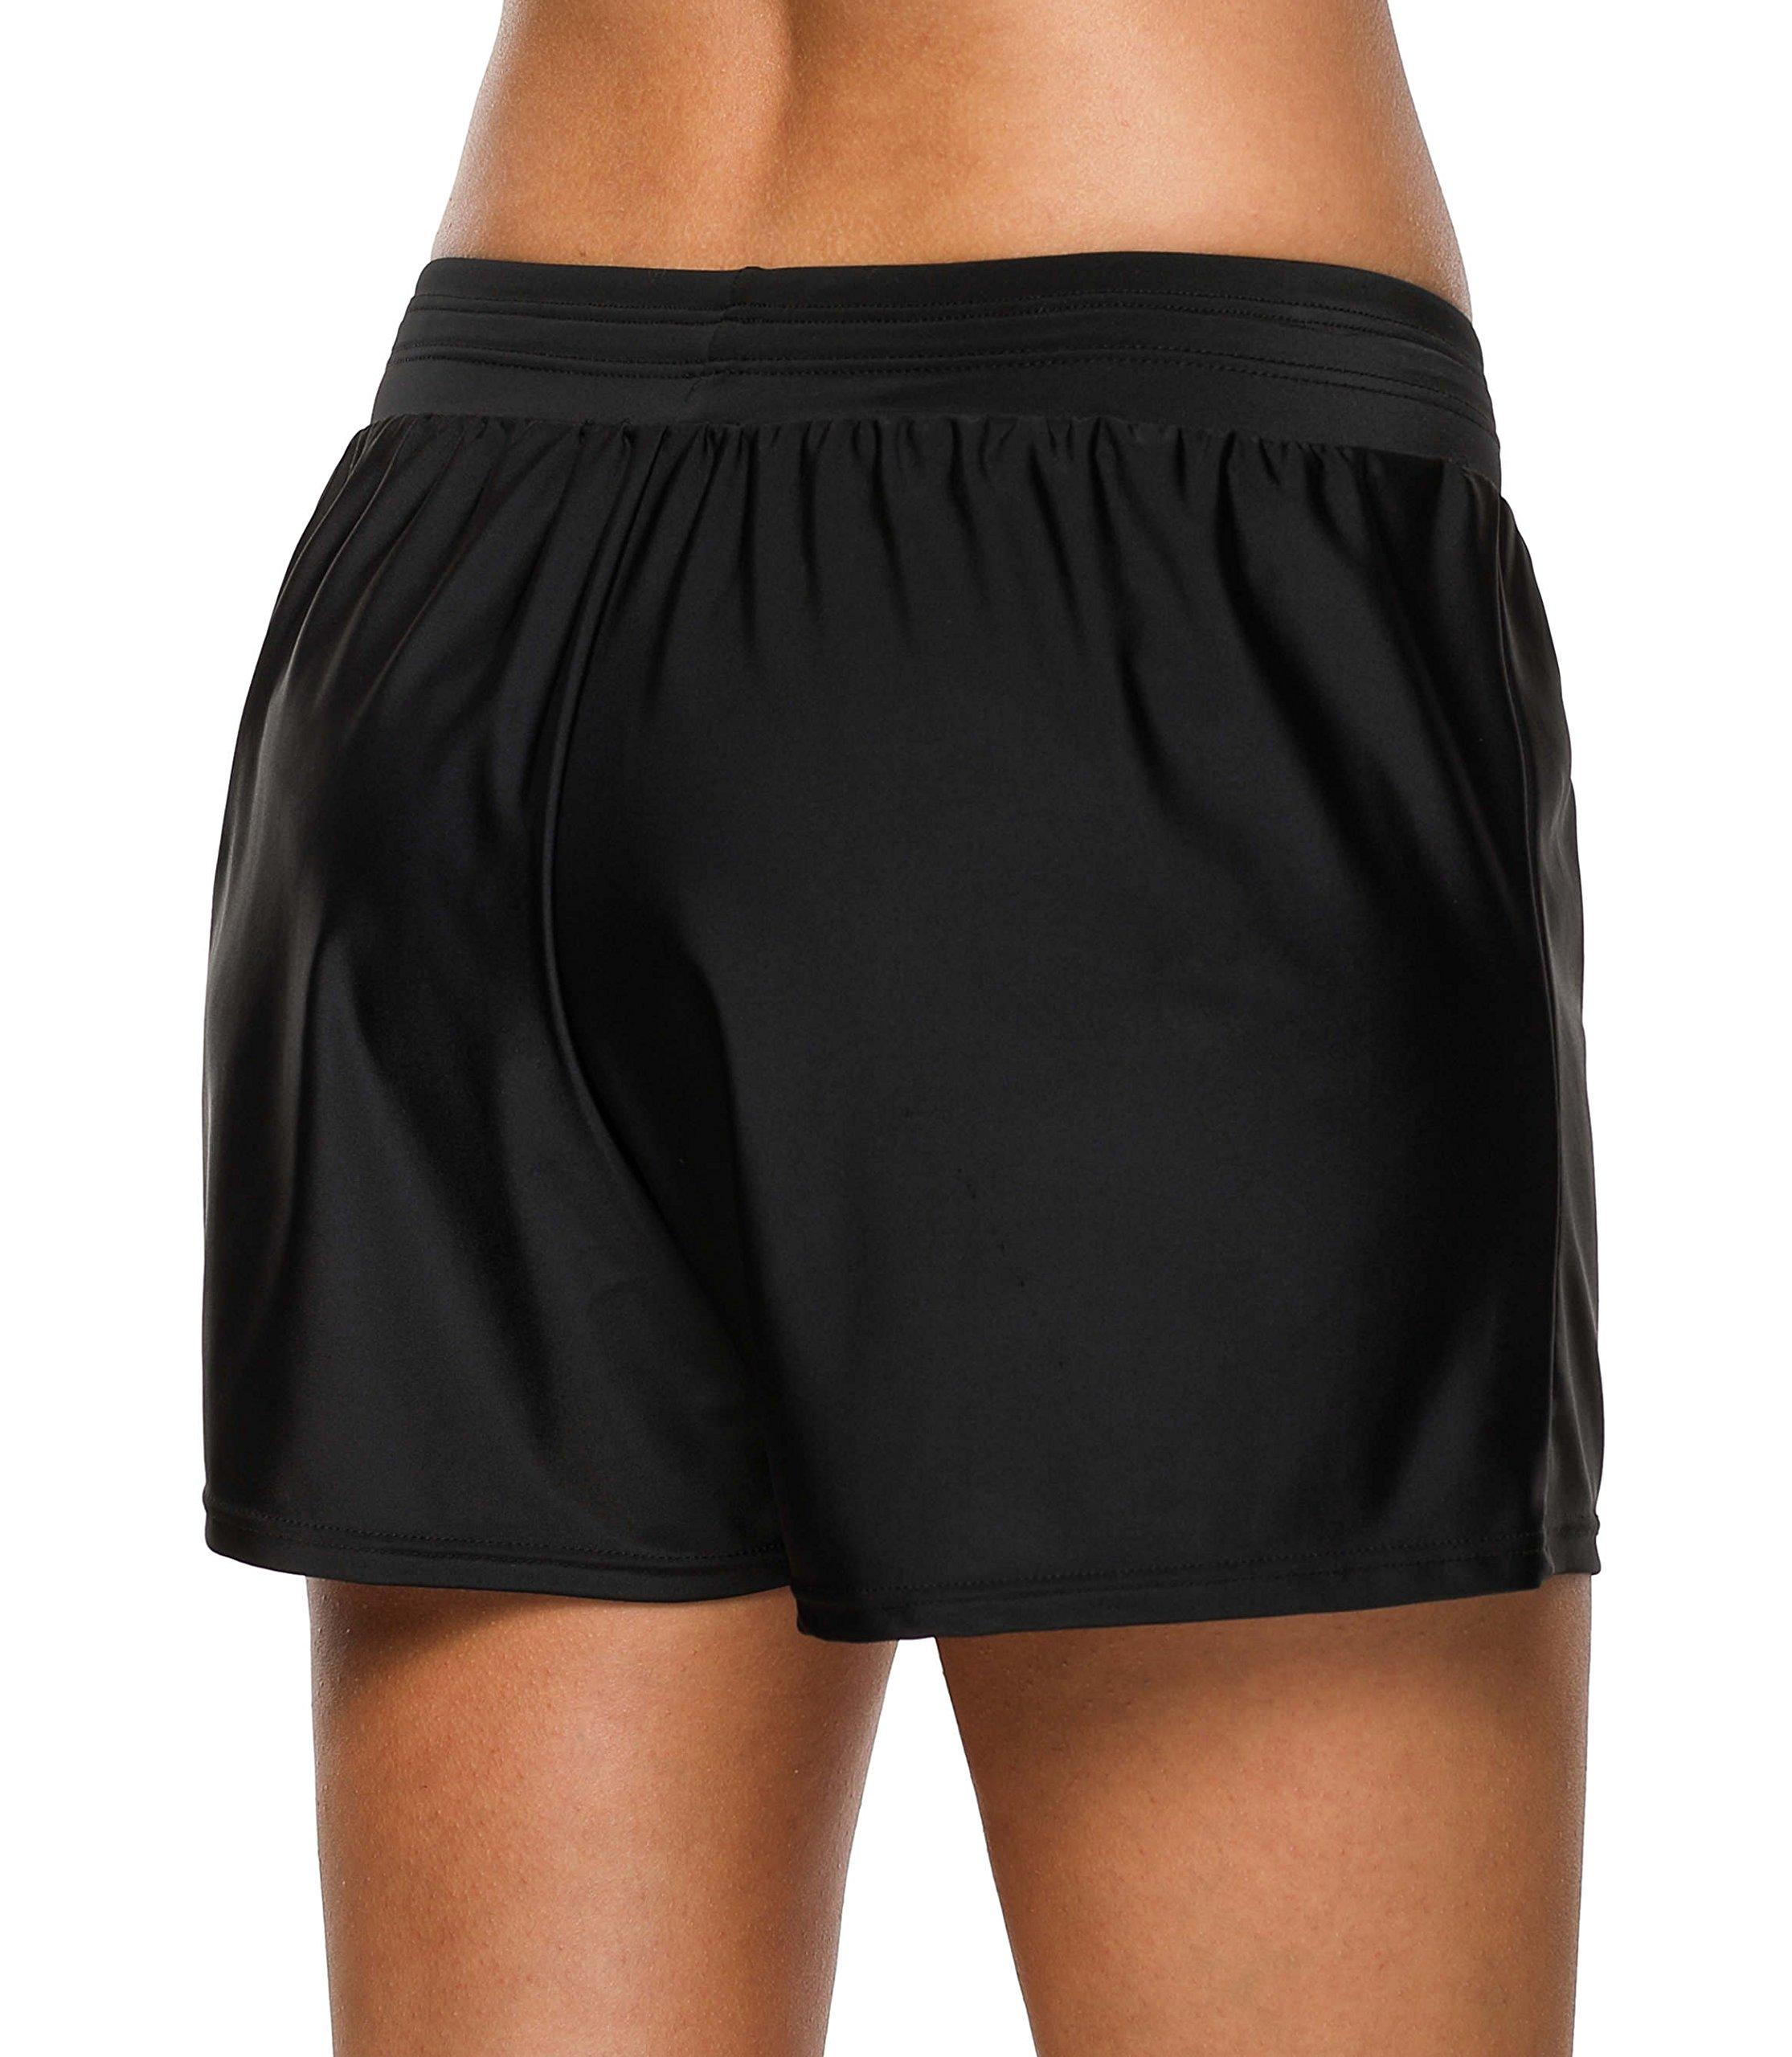 beautyin Womens Swim Bottoms Board Shorts Swimsuit Bathing Suit Shorts Black 2XL by beautyin (Image #4)